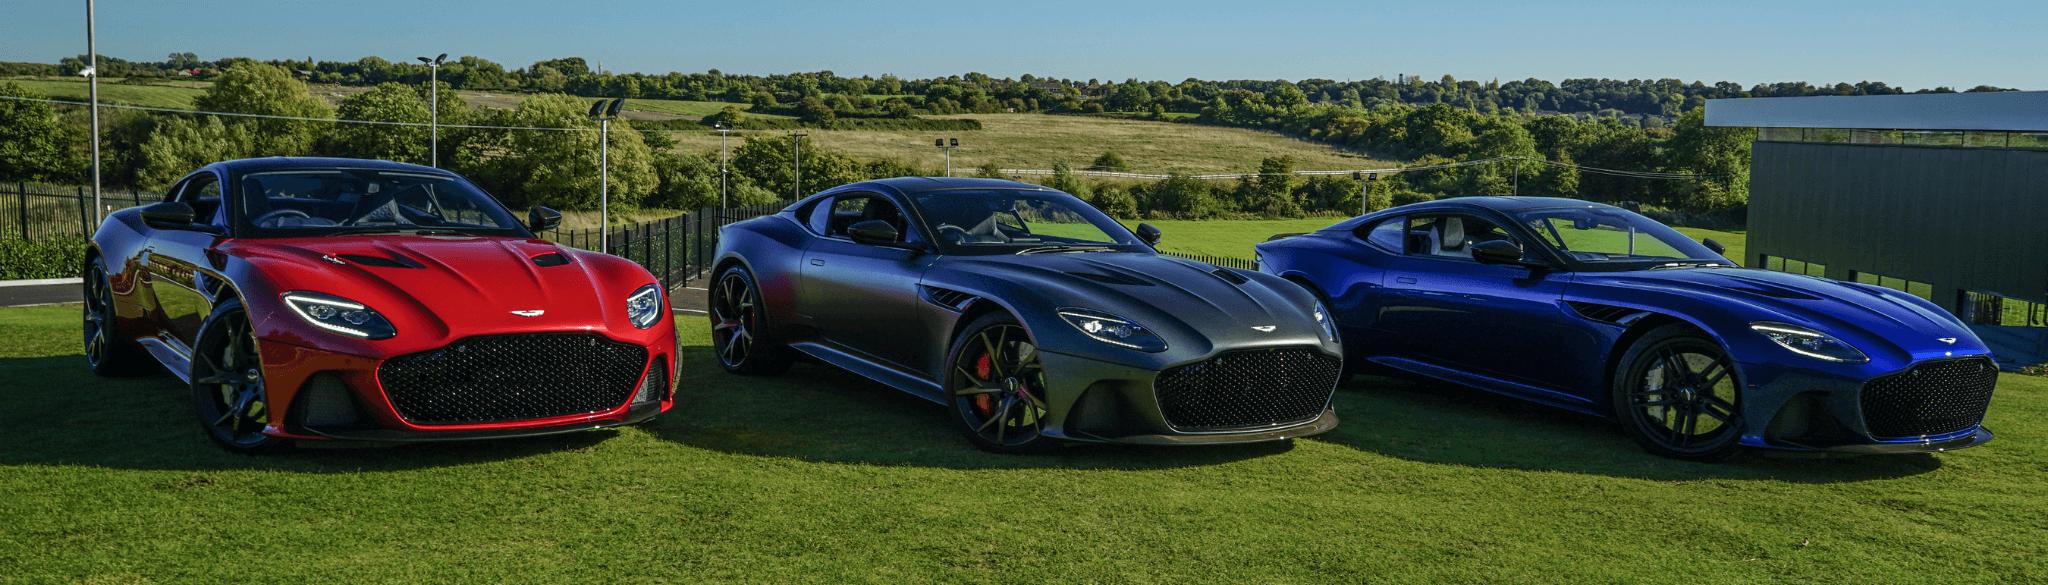 DBS Superleggera Aston Martin Bristol (1)